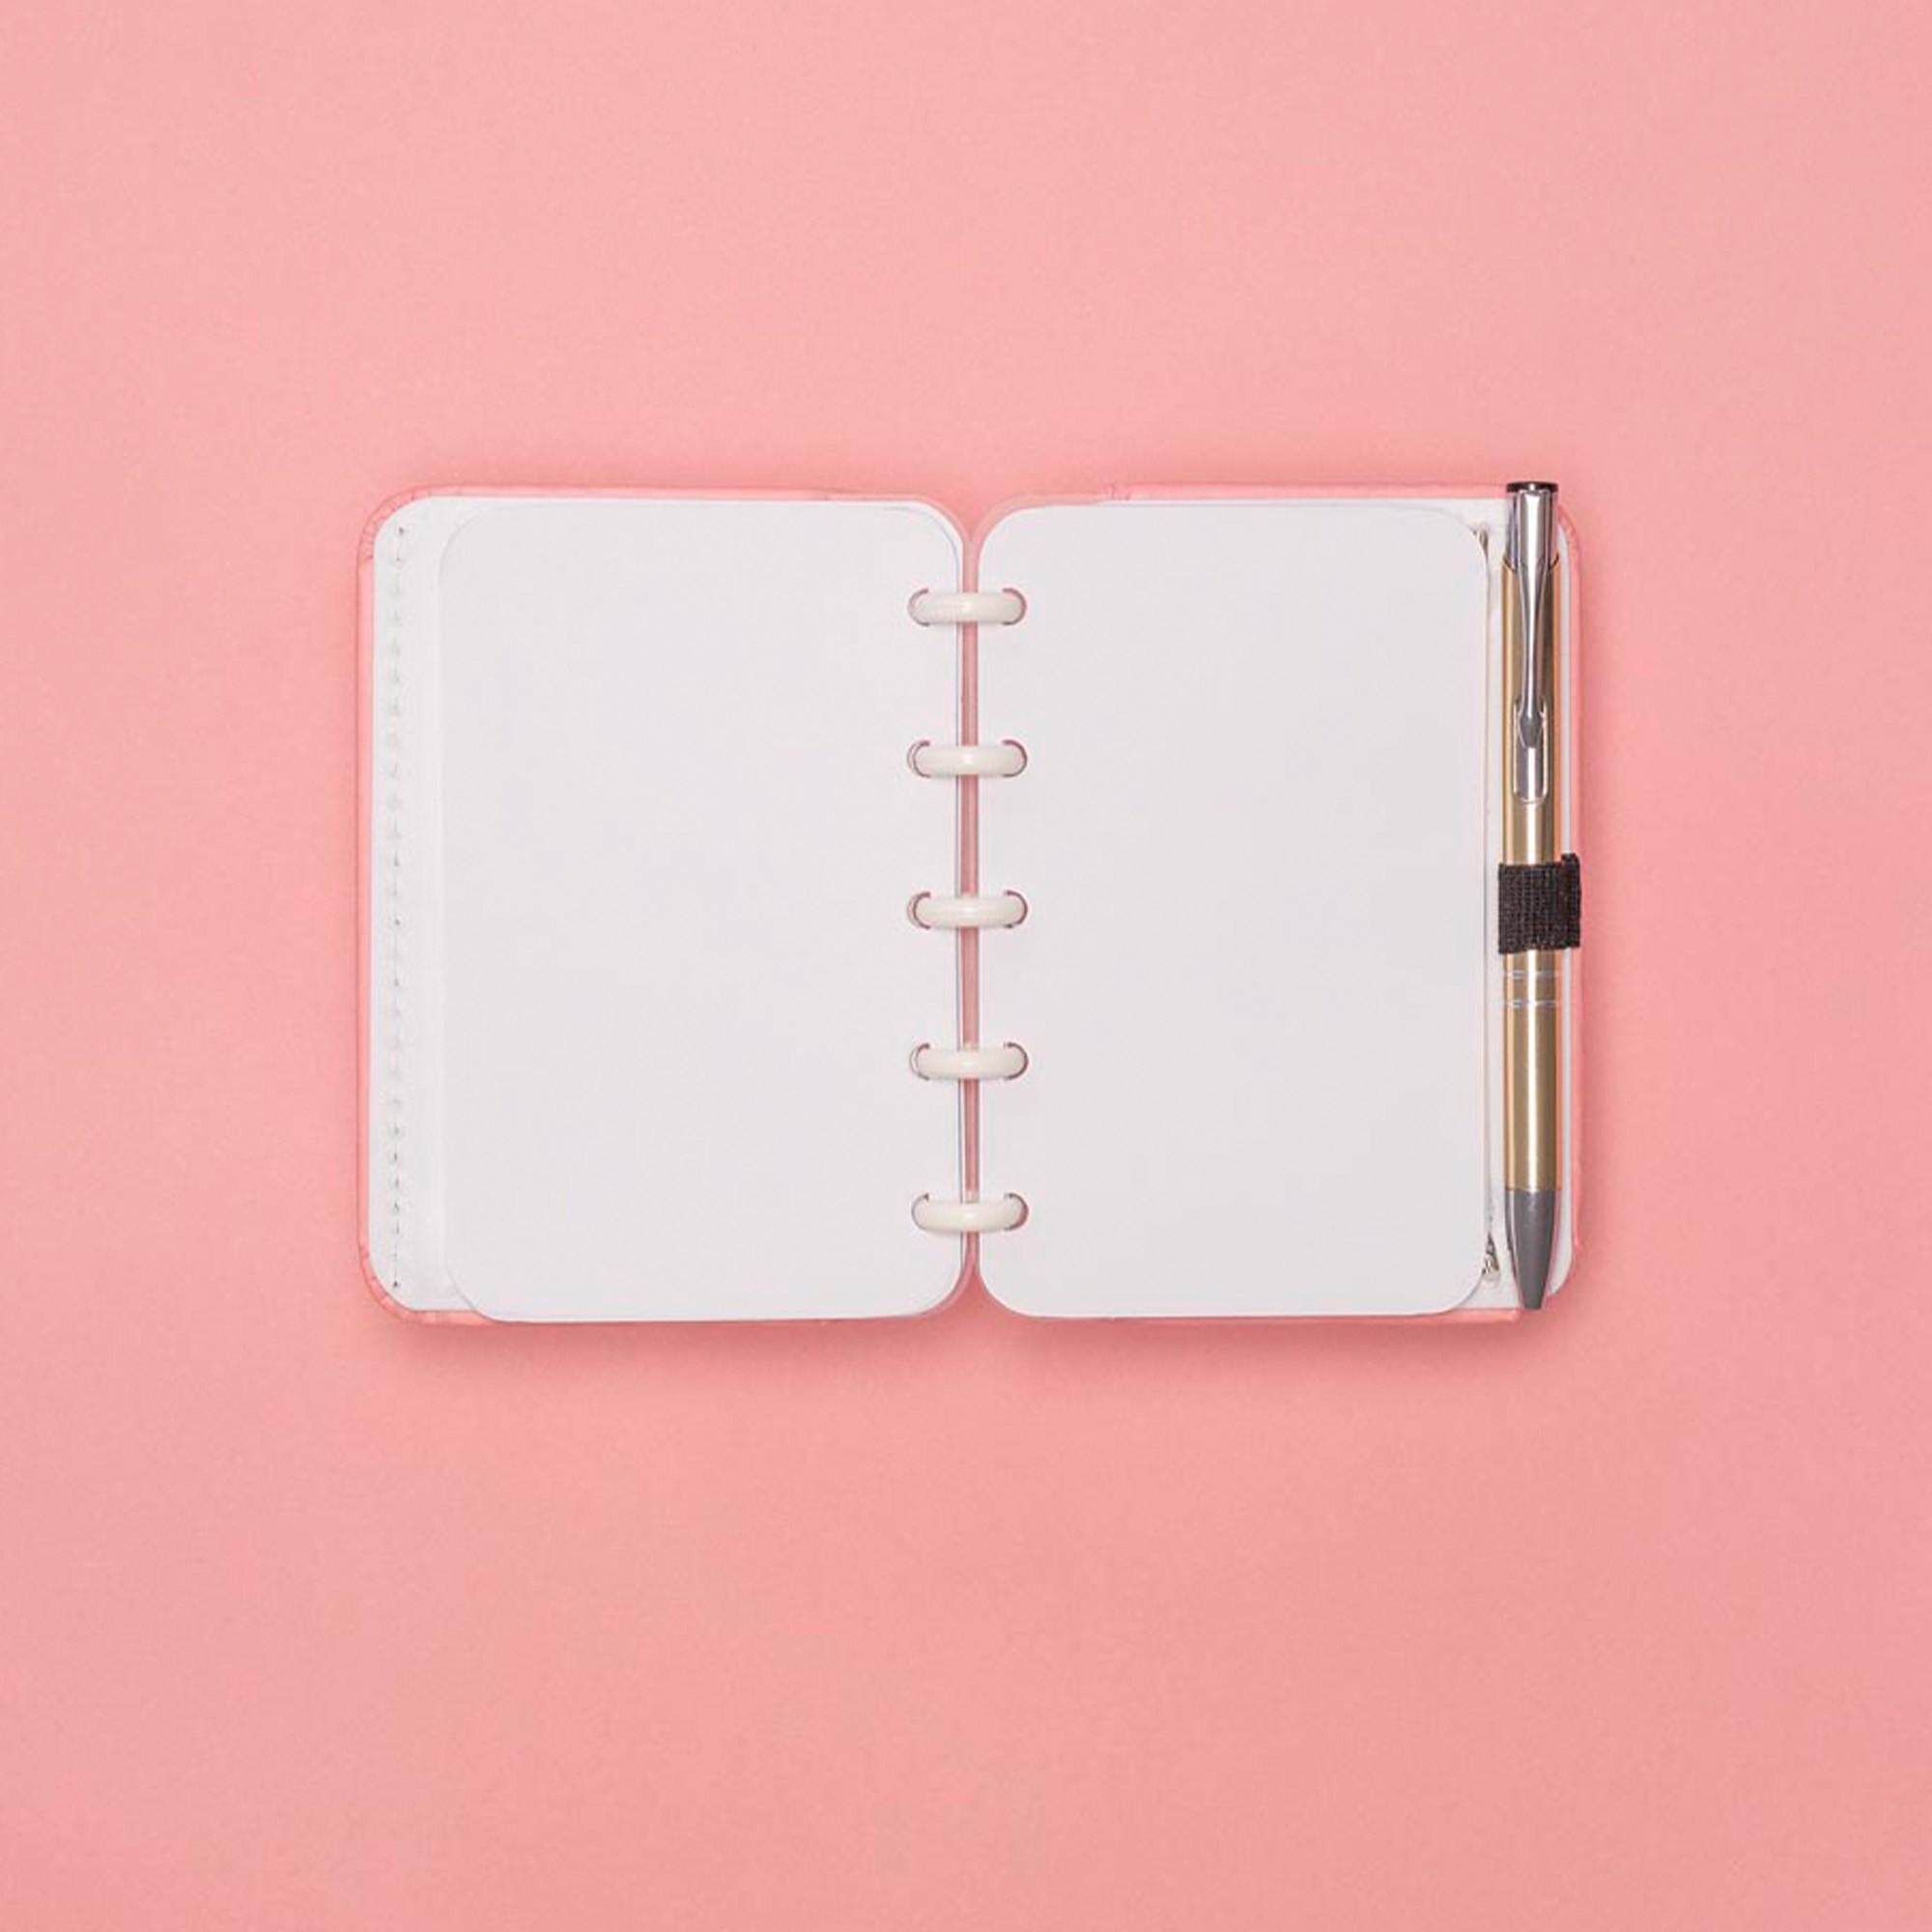 Caderno Inteligente Inteligine Tons Pastel Rose